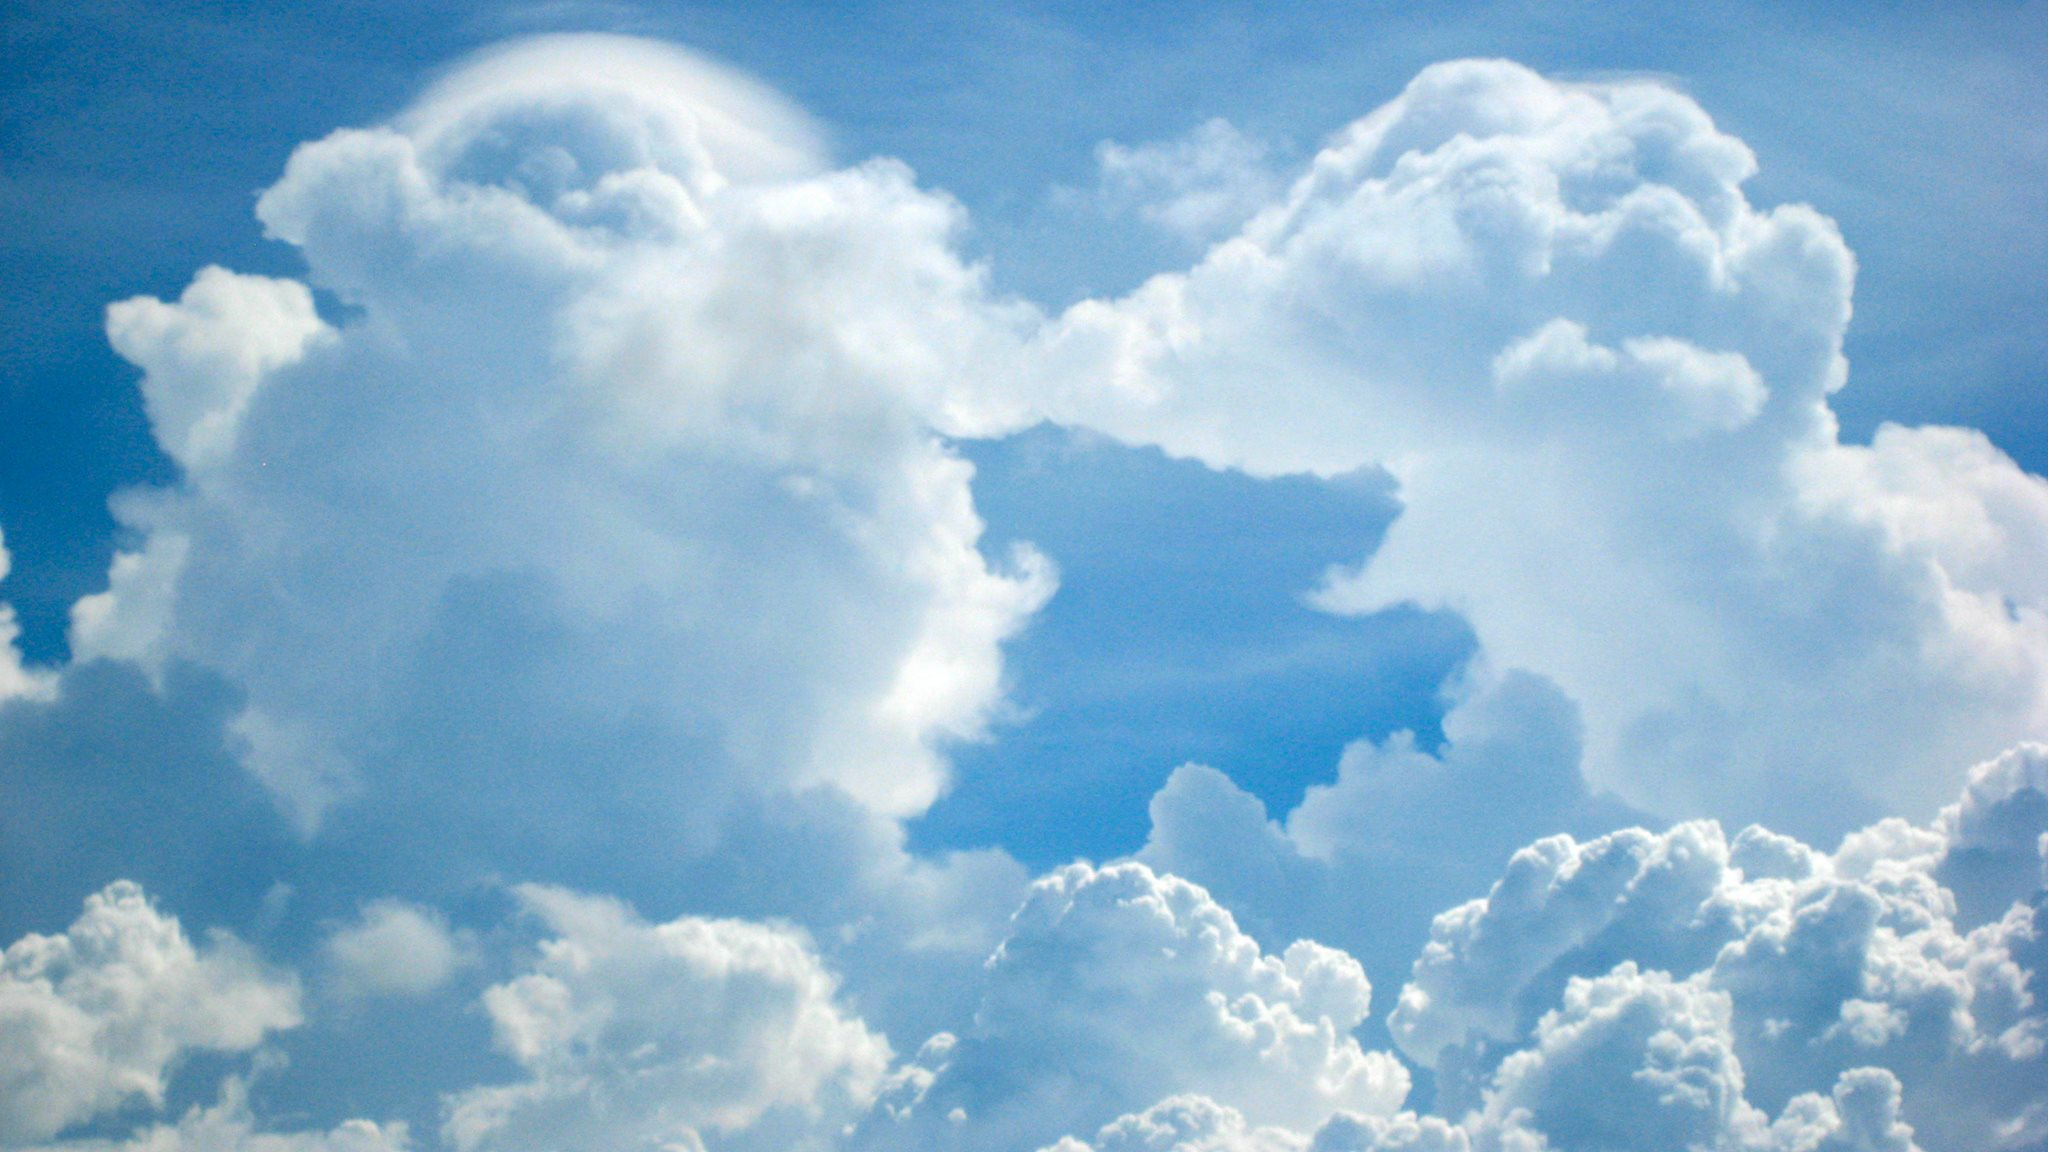 Spelende olifanten in de wolken